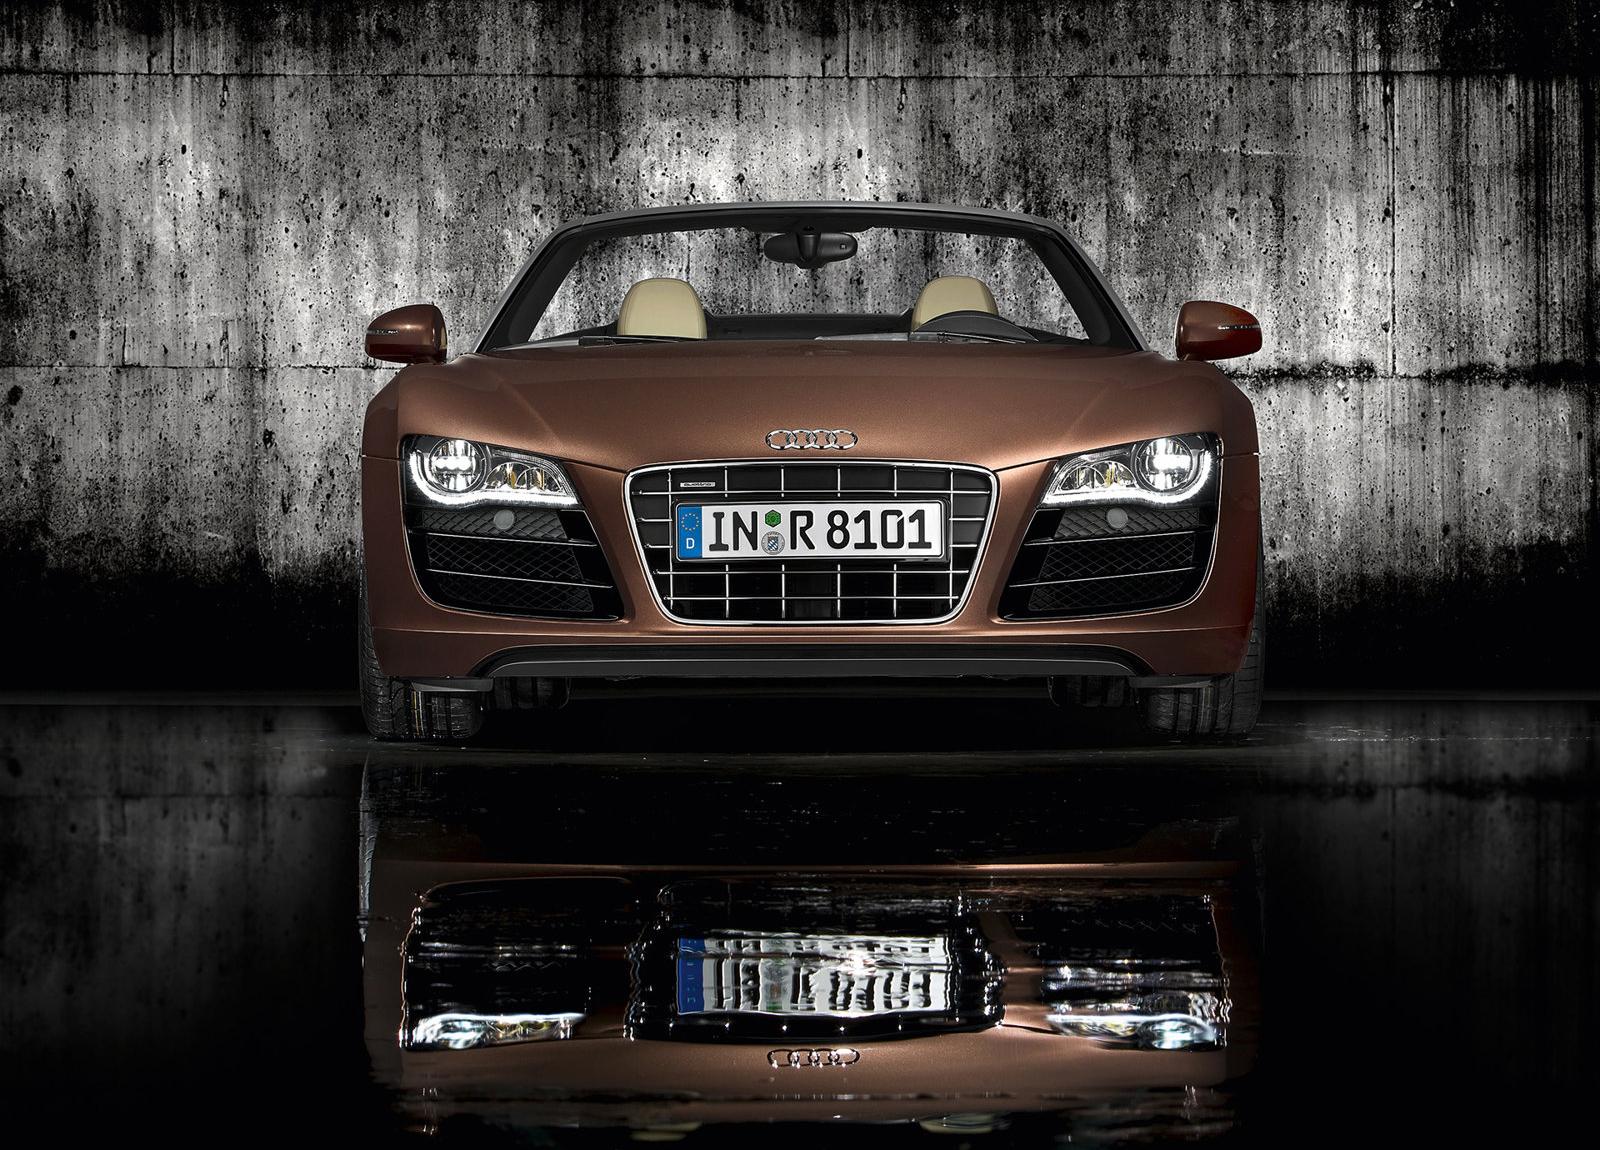 http://3.bp.blogspot.com/-eByev3ag3Bg/T5pm14zFdHI/AAAAAAAAF50/uUrYPuhRKzU/s1600/Audi-R8_Spyder_5.2_FSI_quattro_2011_1600x1200_wallpaper_29.jpg